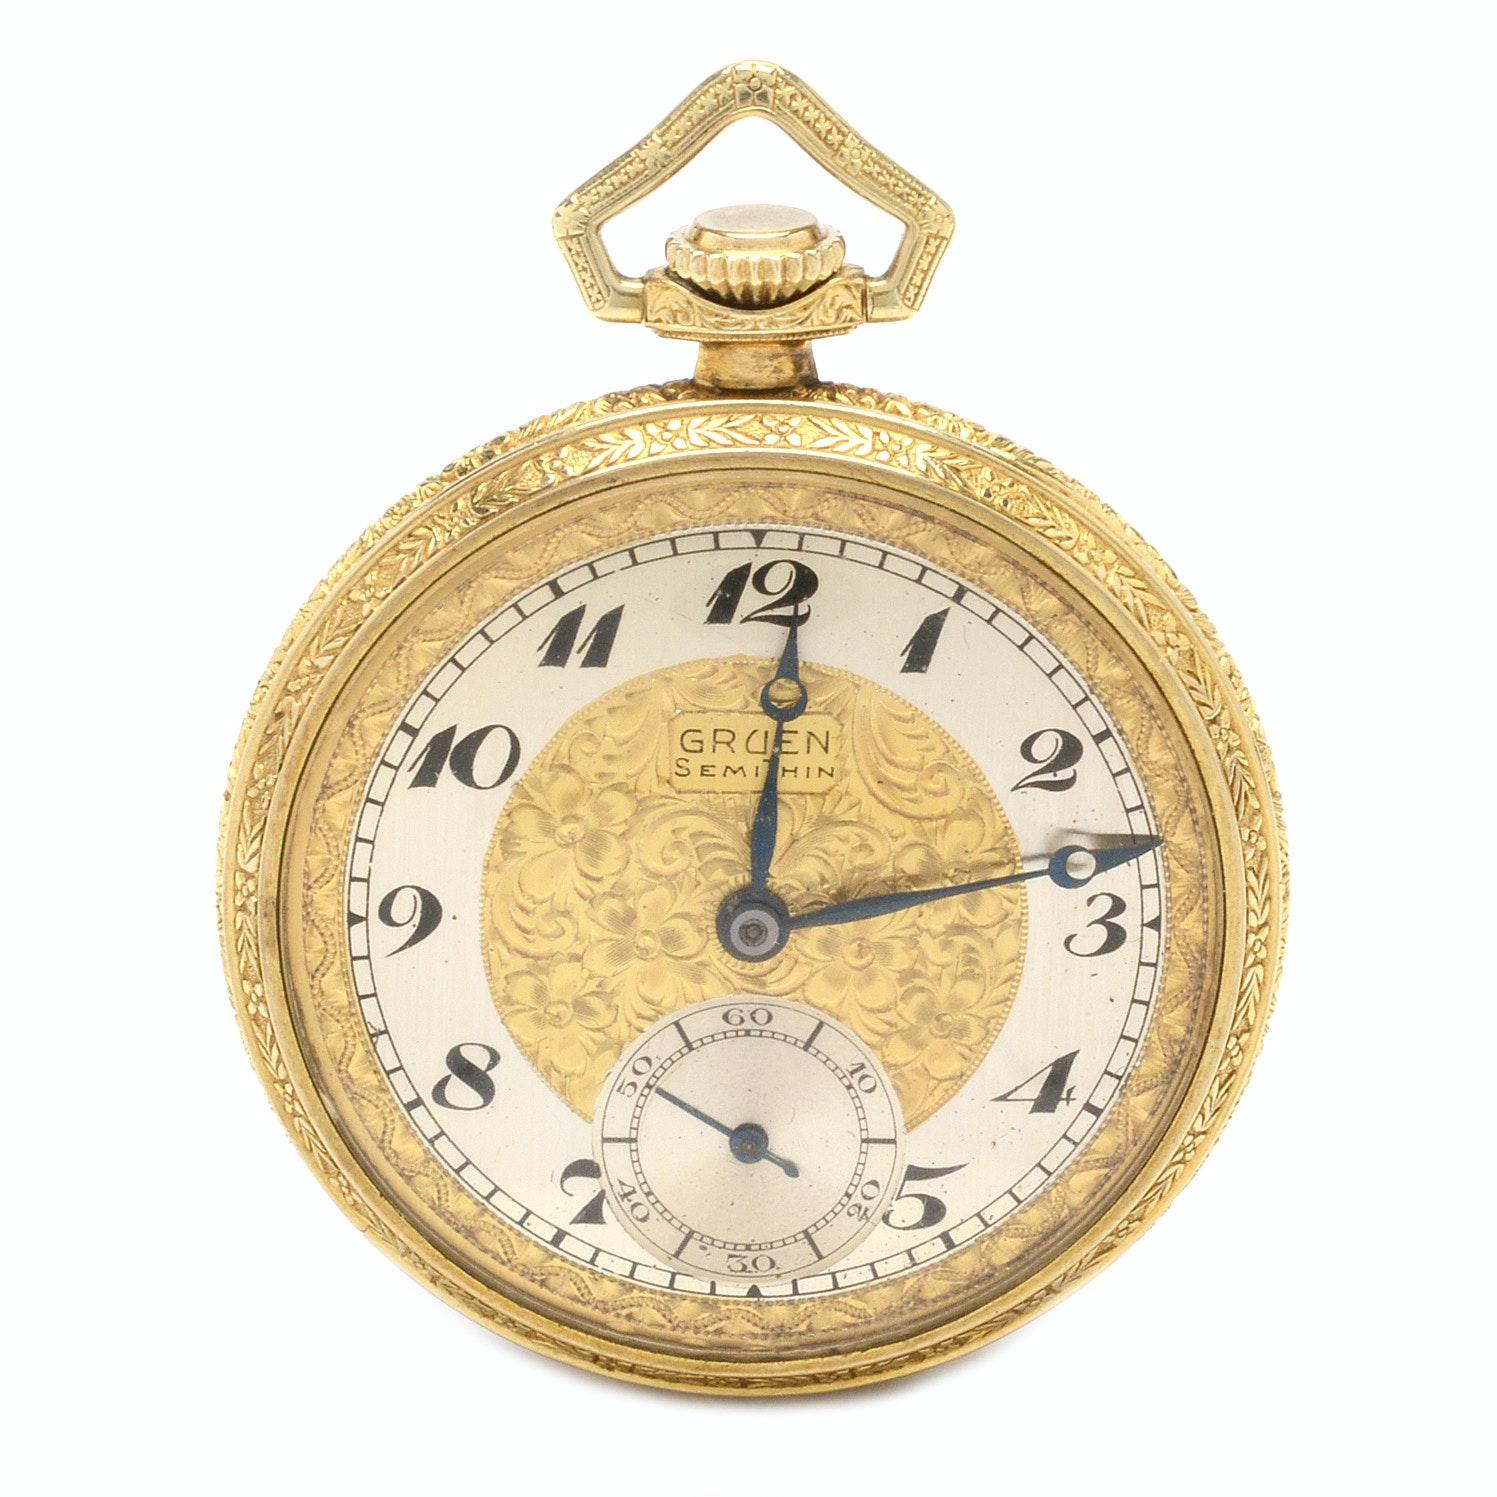 Gruen Gold Filled SemiThin Open Face Pocket Watch